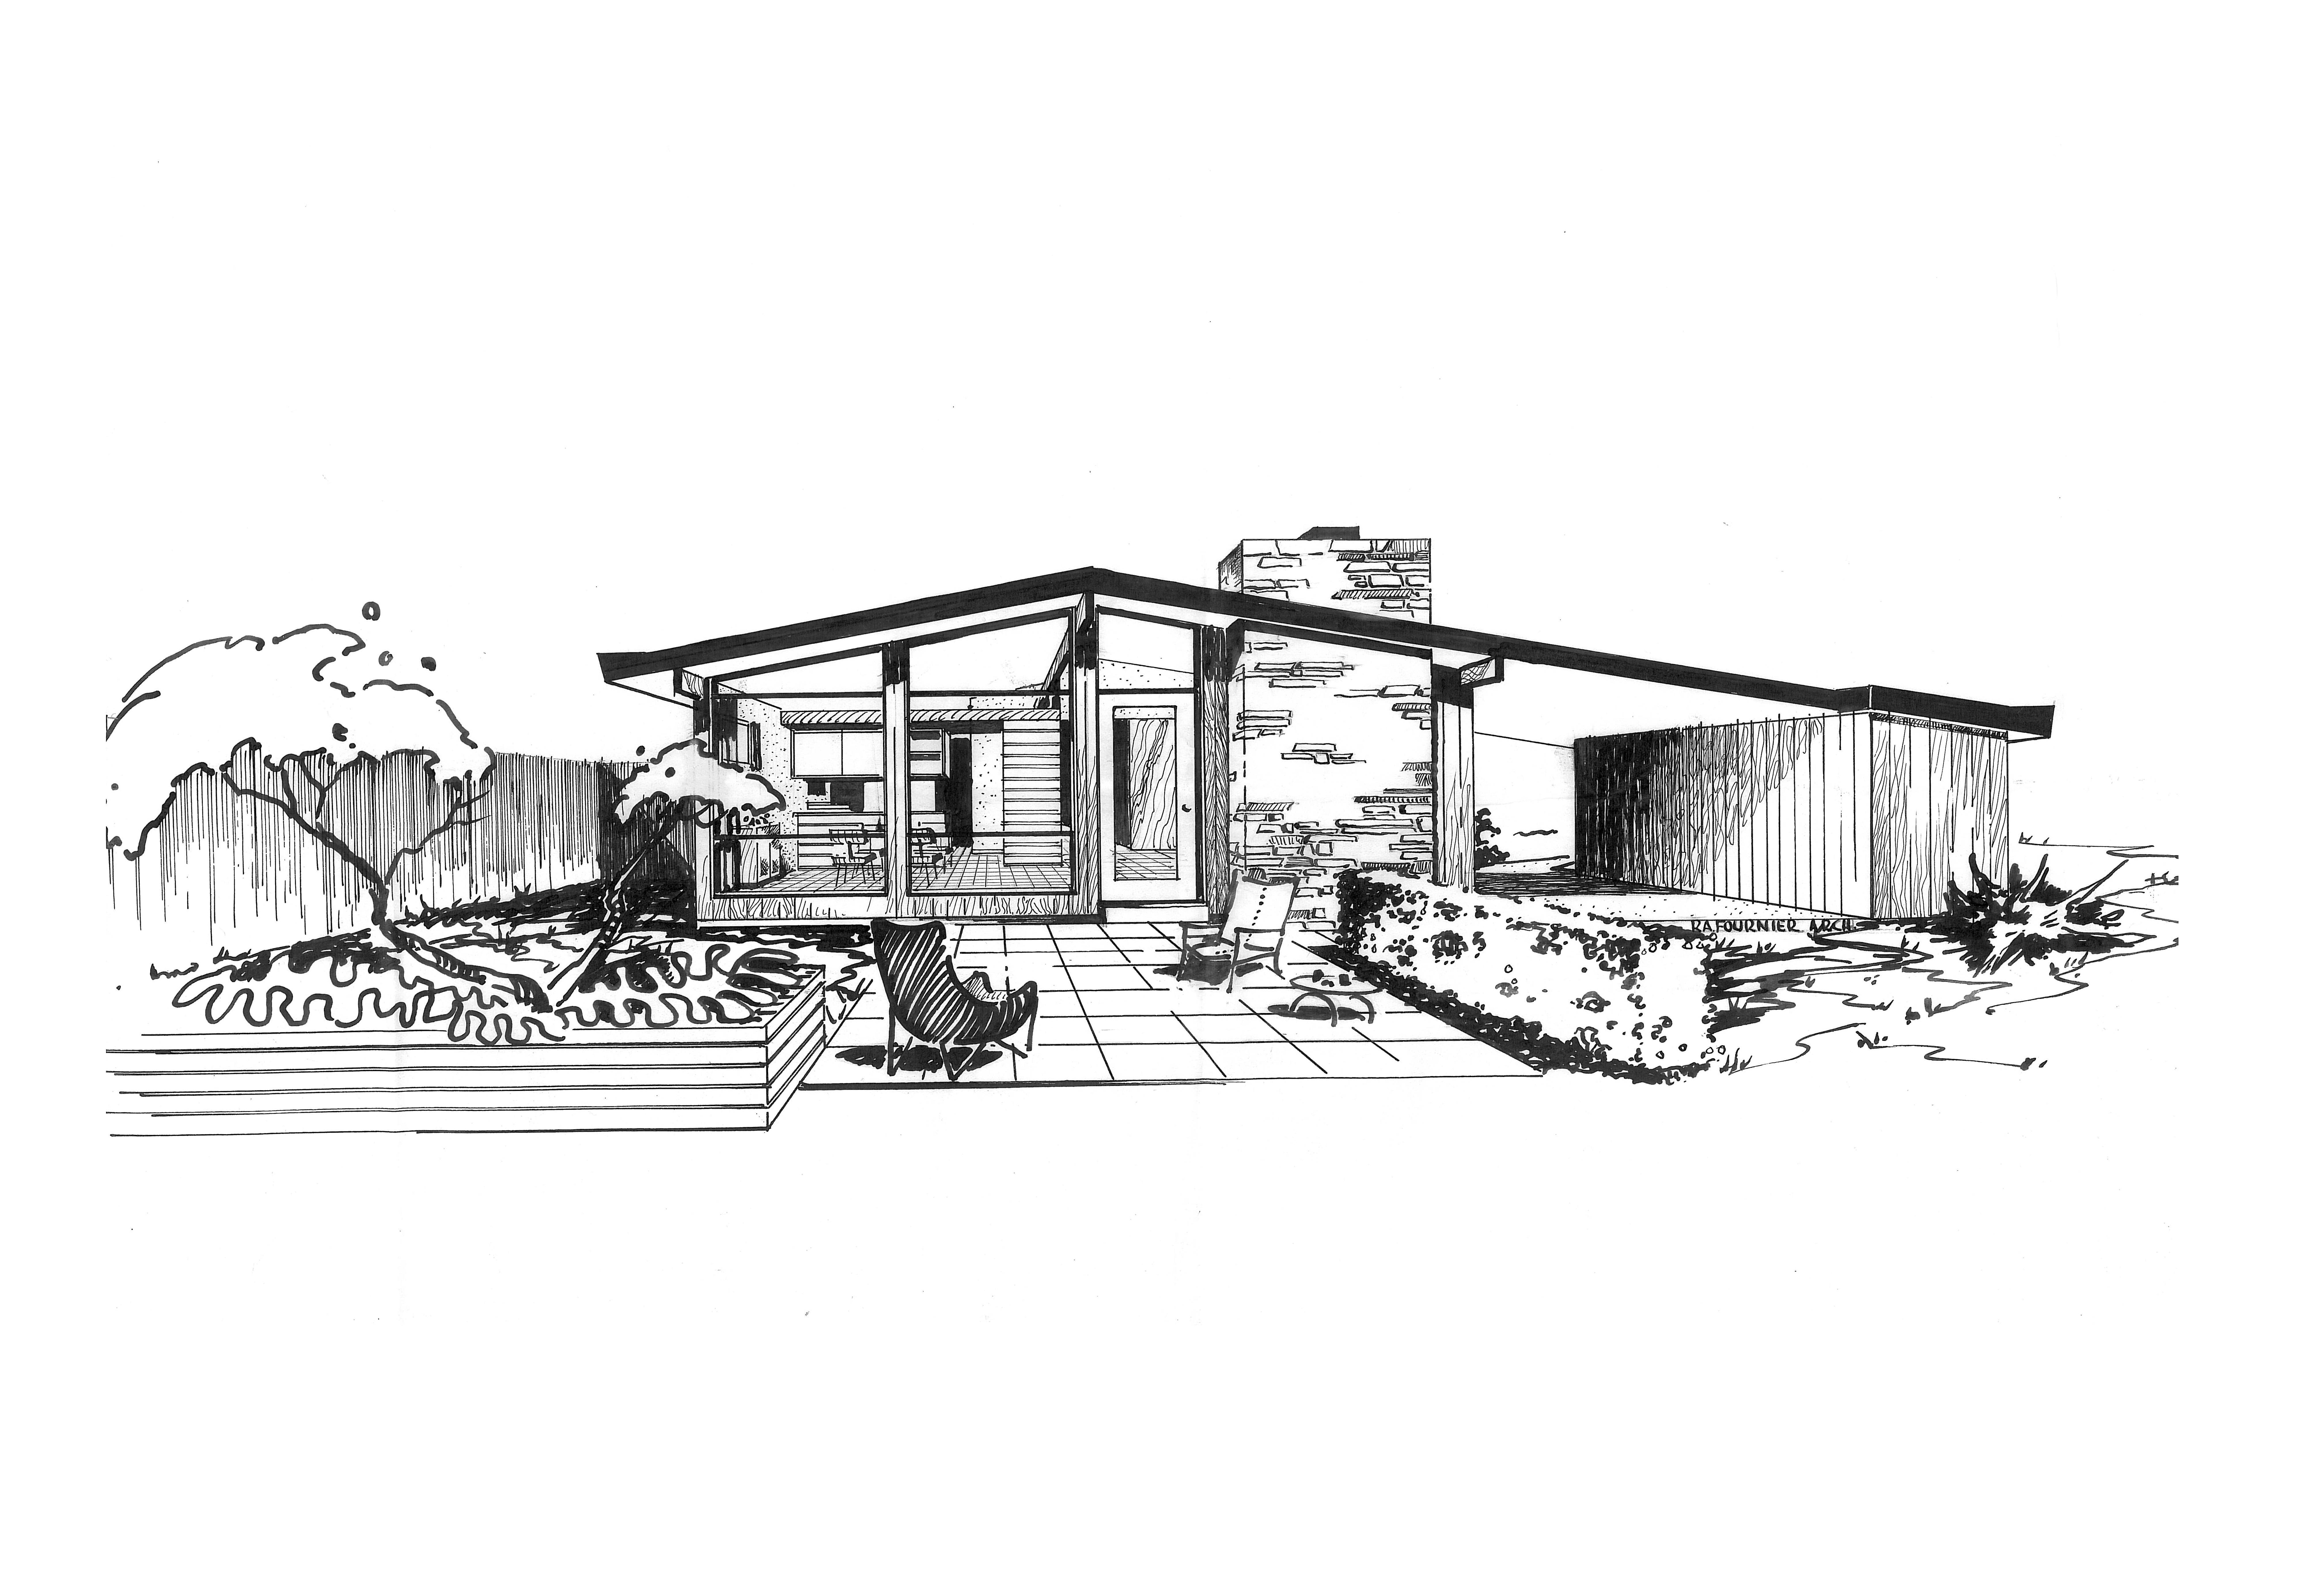 Ridgewood House sketch, St. Louis midcentury modernism, Ralph Fournier